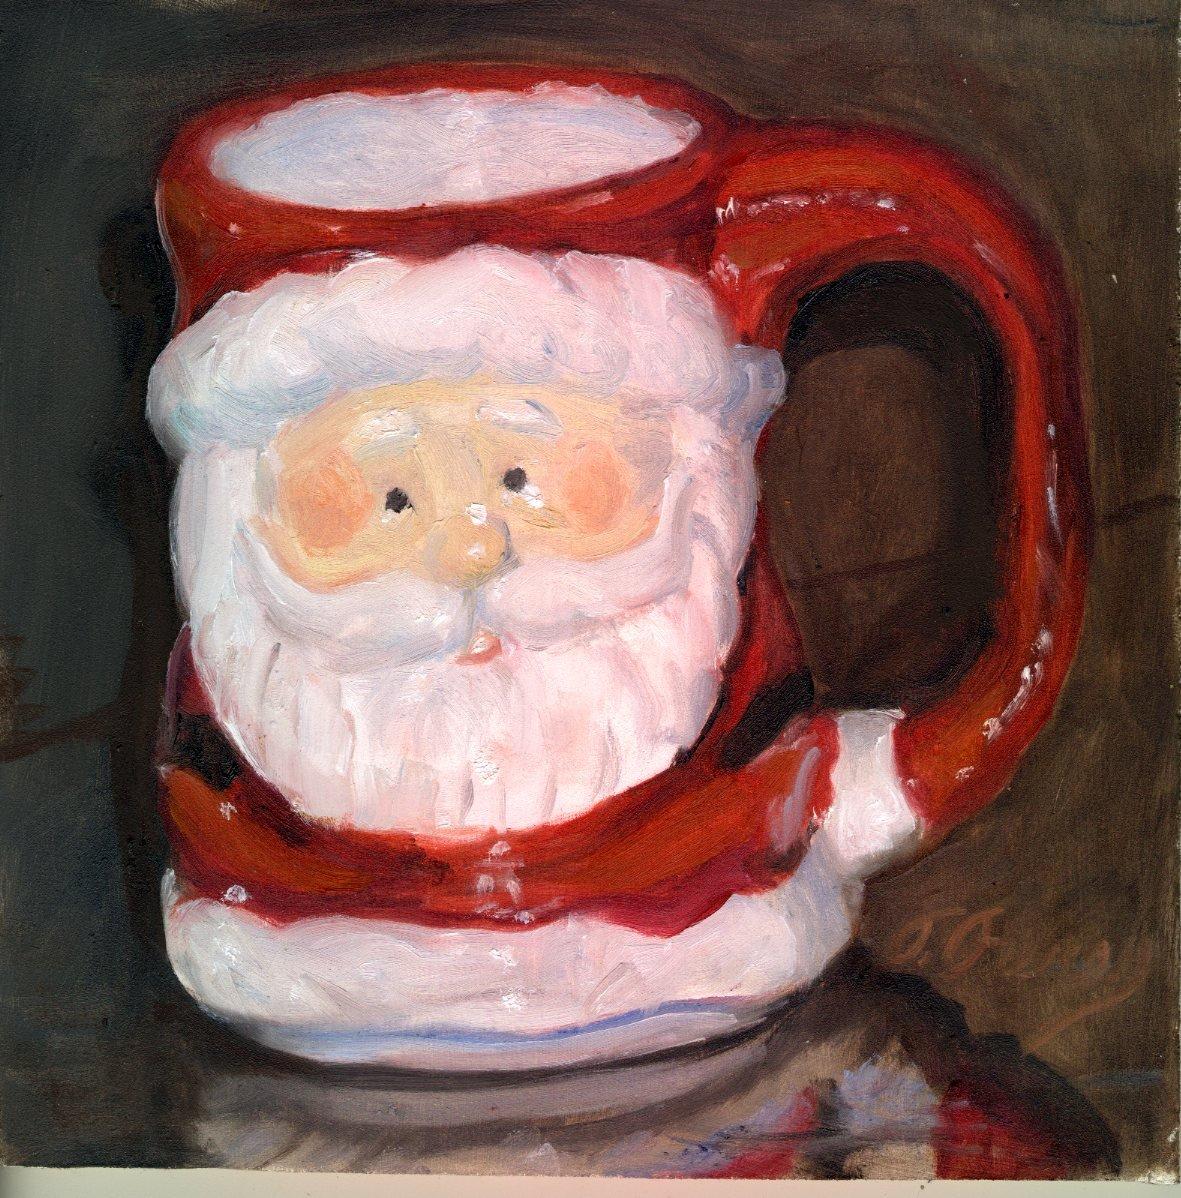 "Santa Mug, Alla Prima Oil Painting on Board, 8"" x 8""."